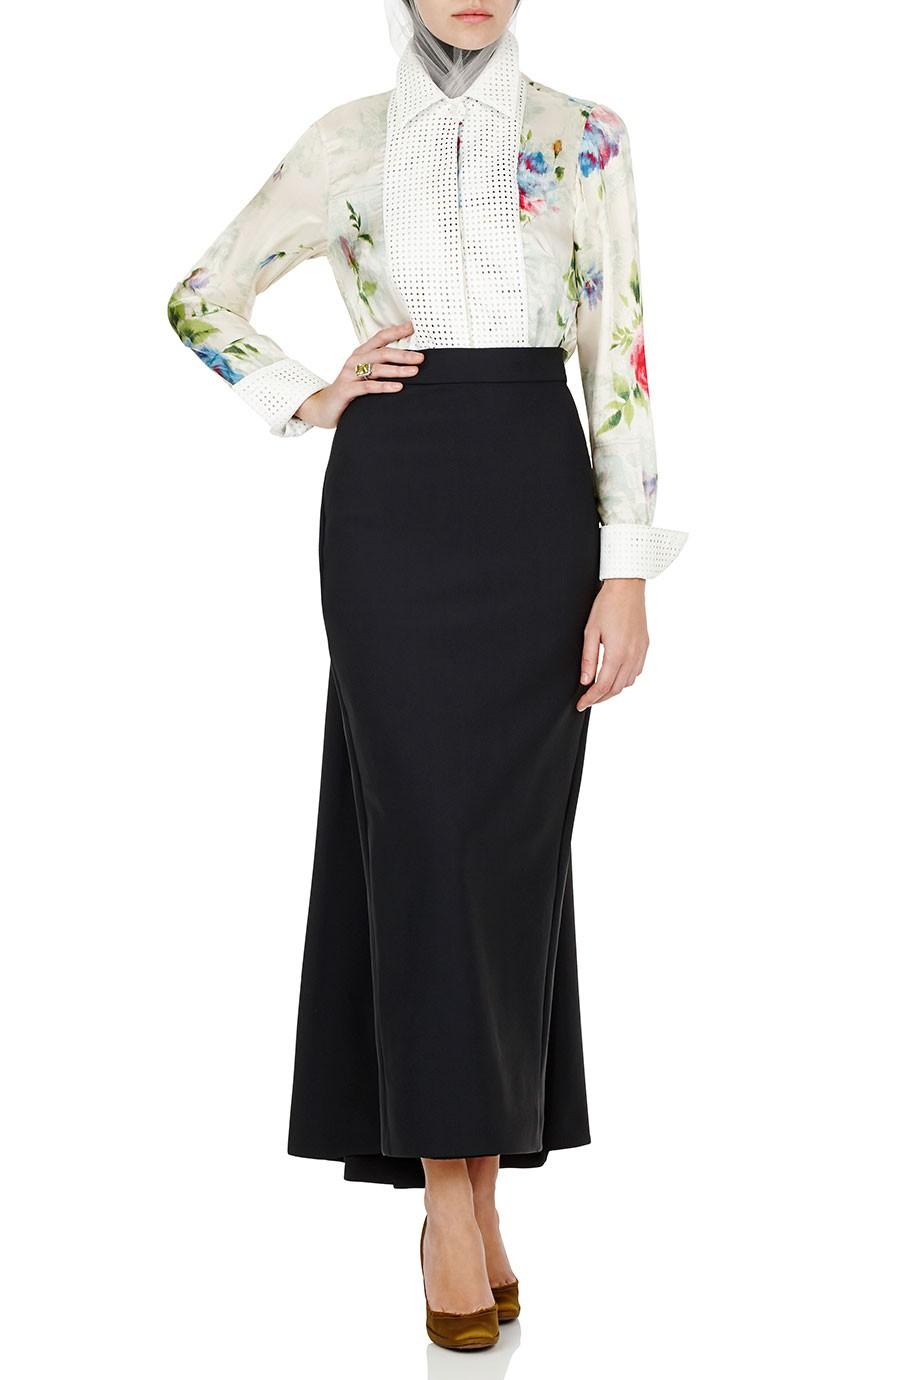 Diana-Kotb-Time-Piece-Skirt-Gamne-Maker-Shirt-01